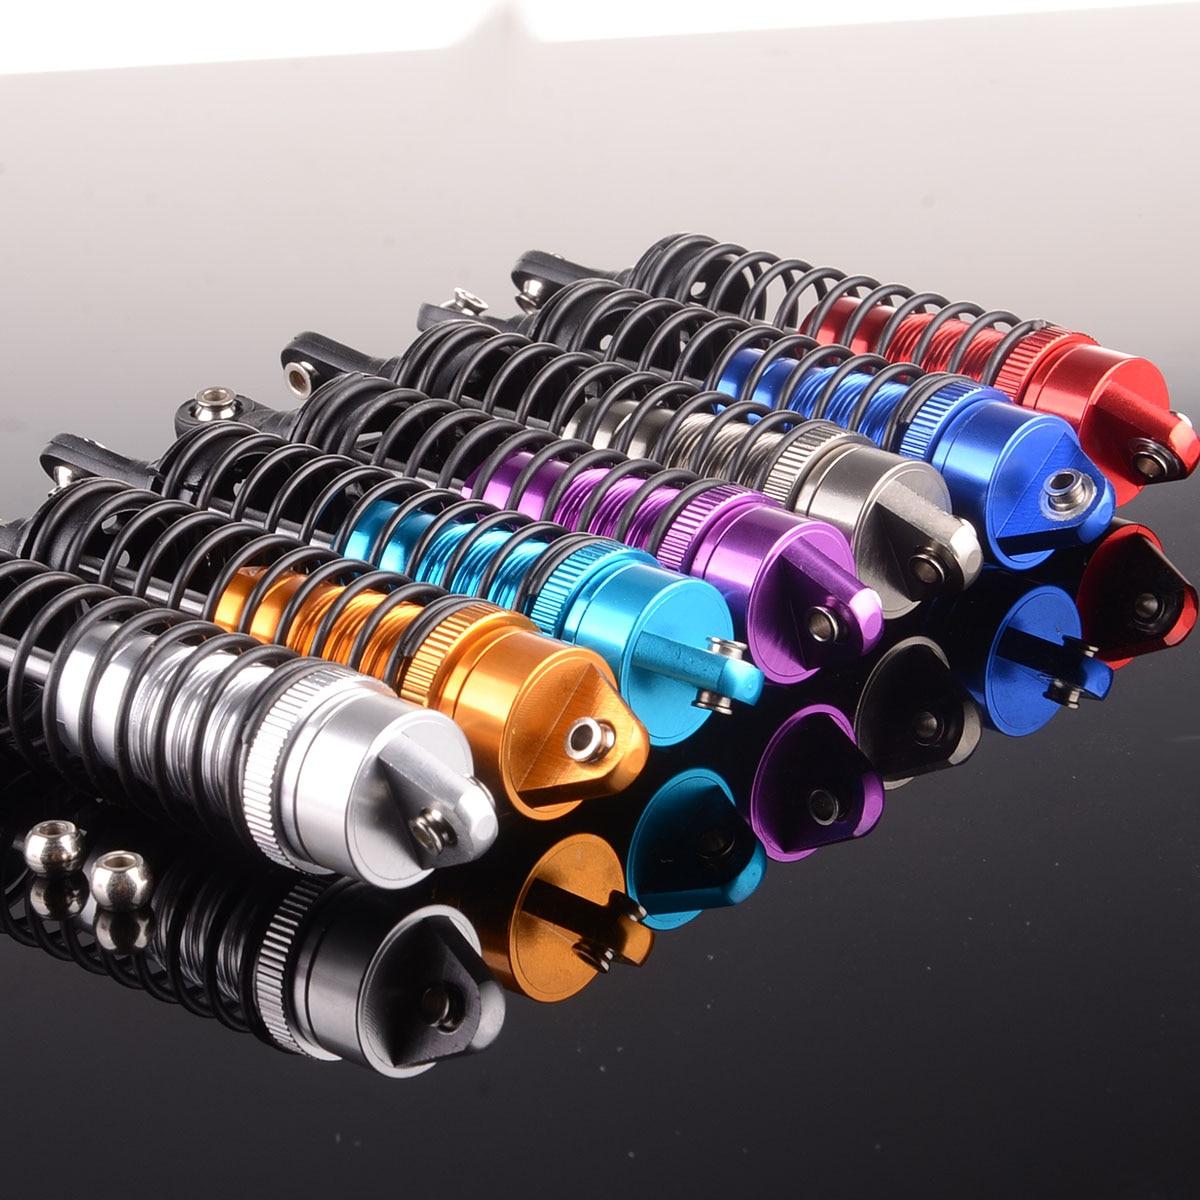 2P RC Aluminum Rear shock absorber 110MM Fit Traxxas Slash 4x4 SLA015